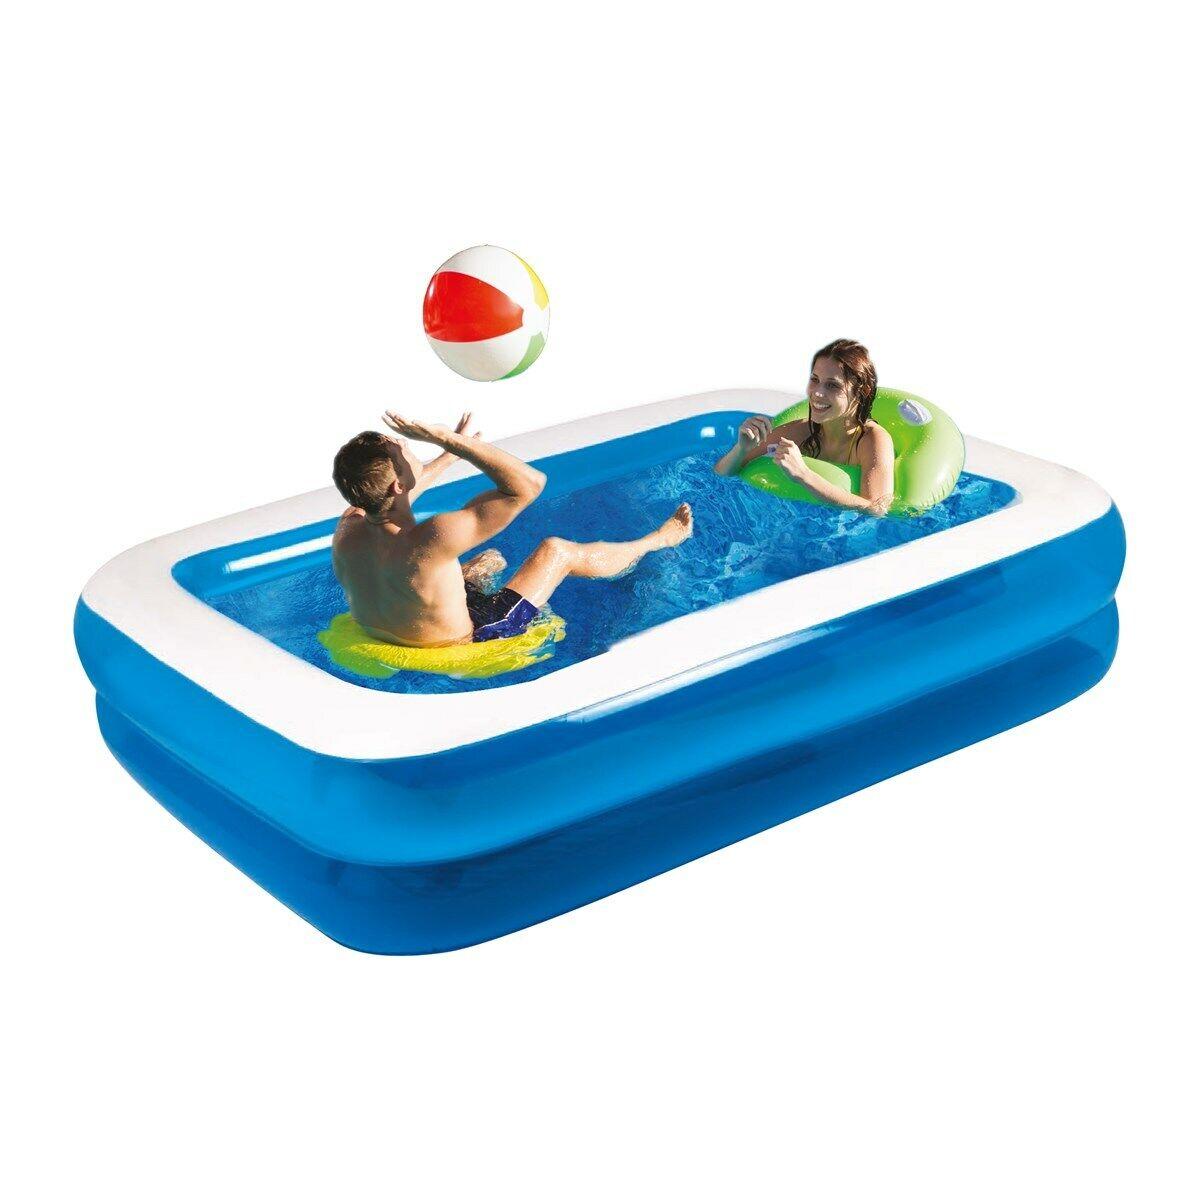 3m Rectangular Inflatable Paddling Swimming Pool Giant Large Leisure Pool Family